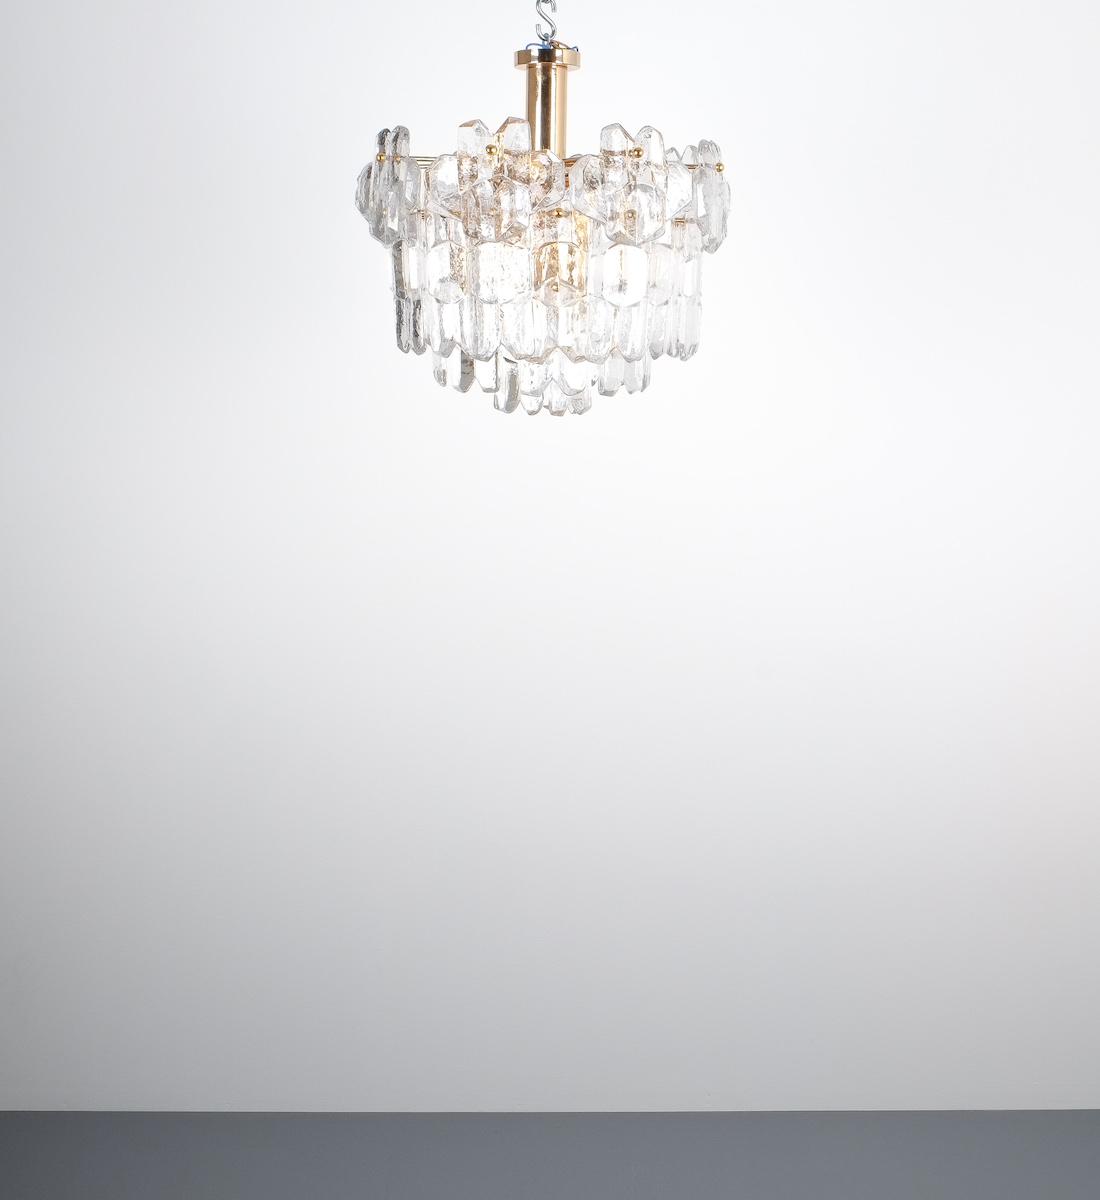 modern mid inch brass globe century fixtures ceiling white crown products chandeliers lighting mount chandelier light flush custom